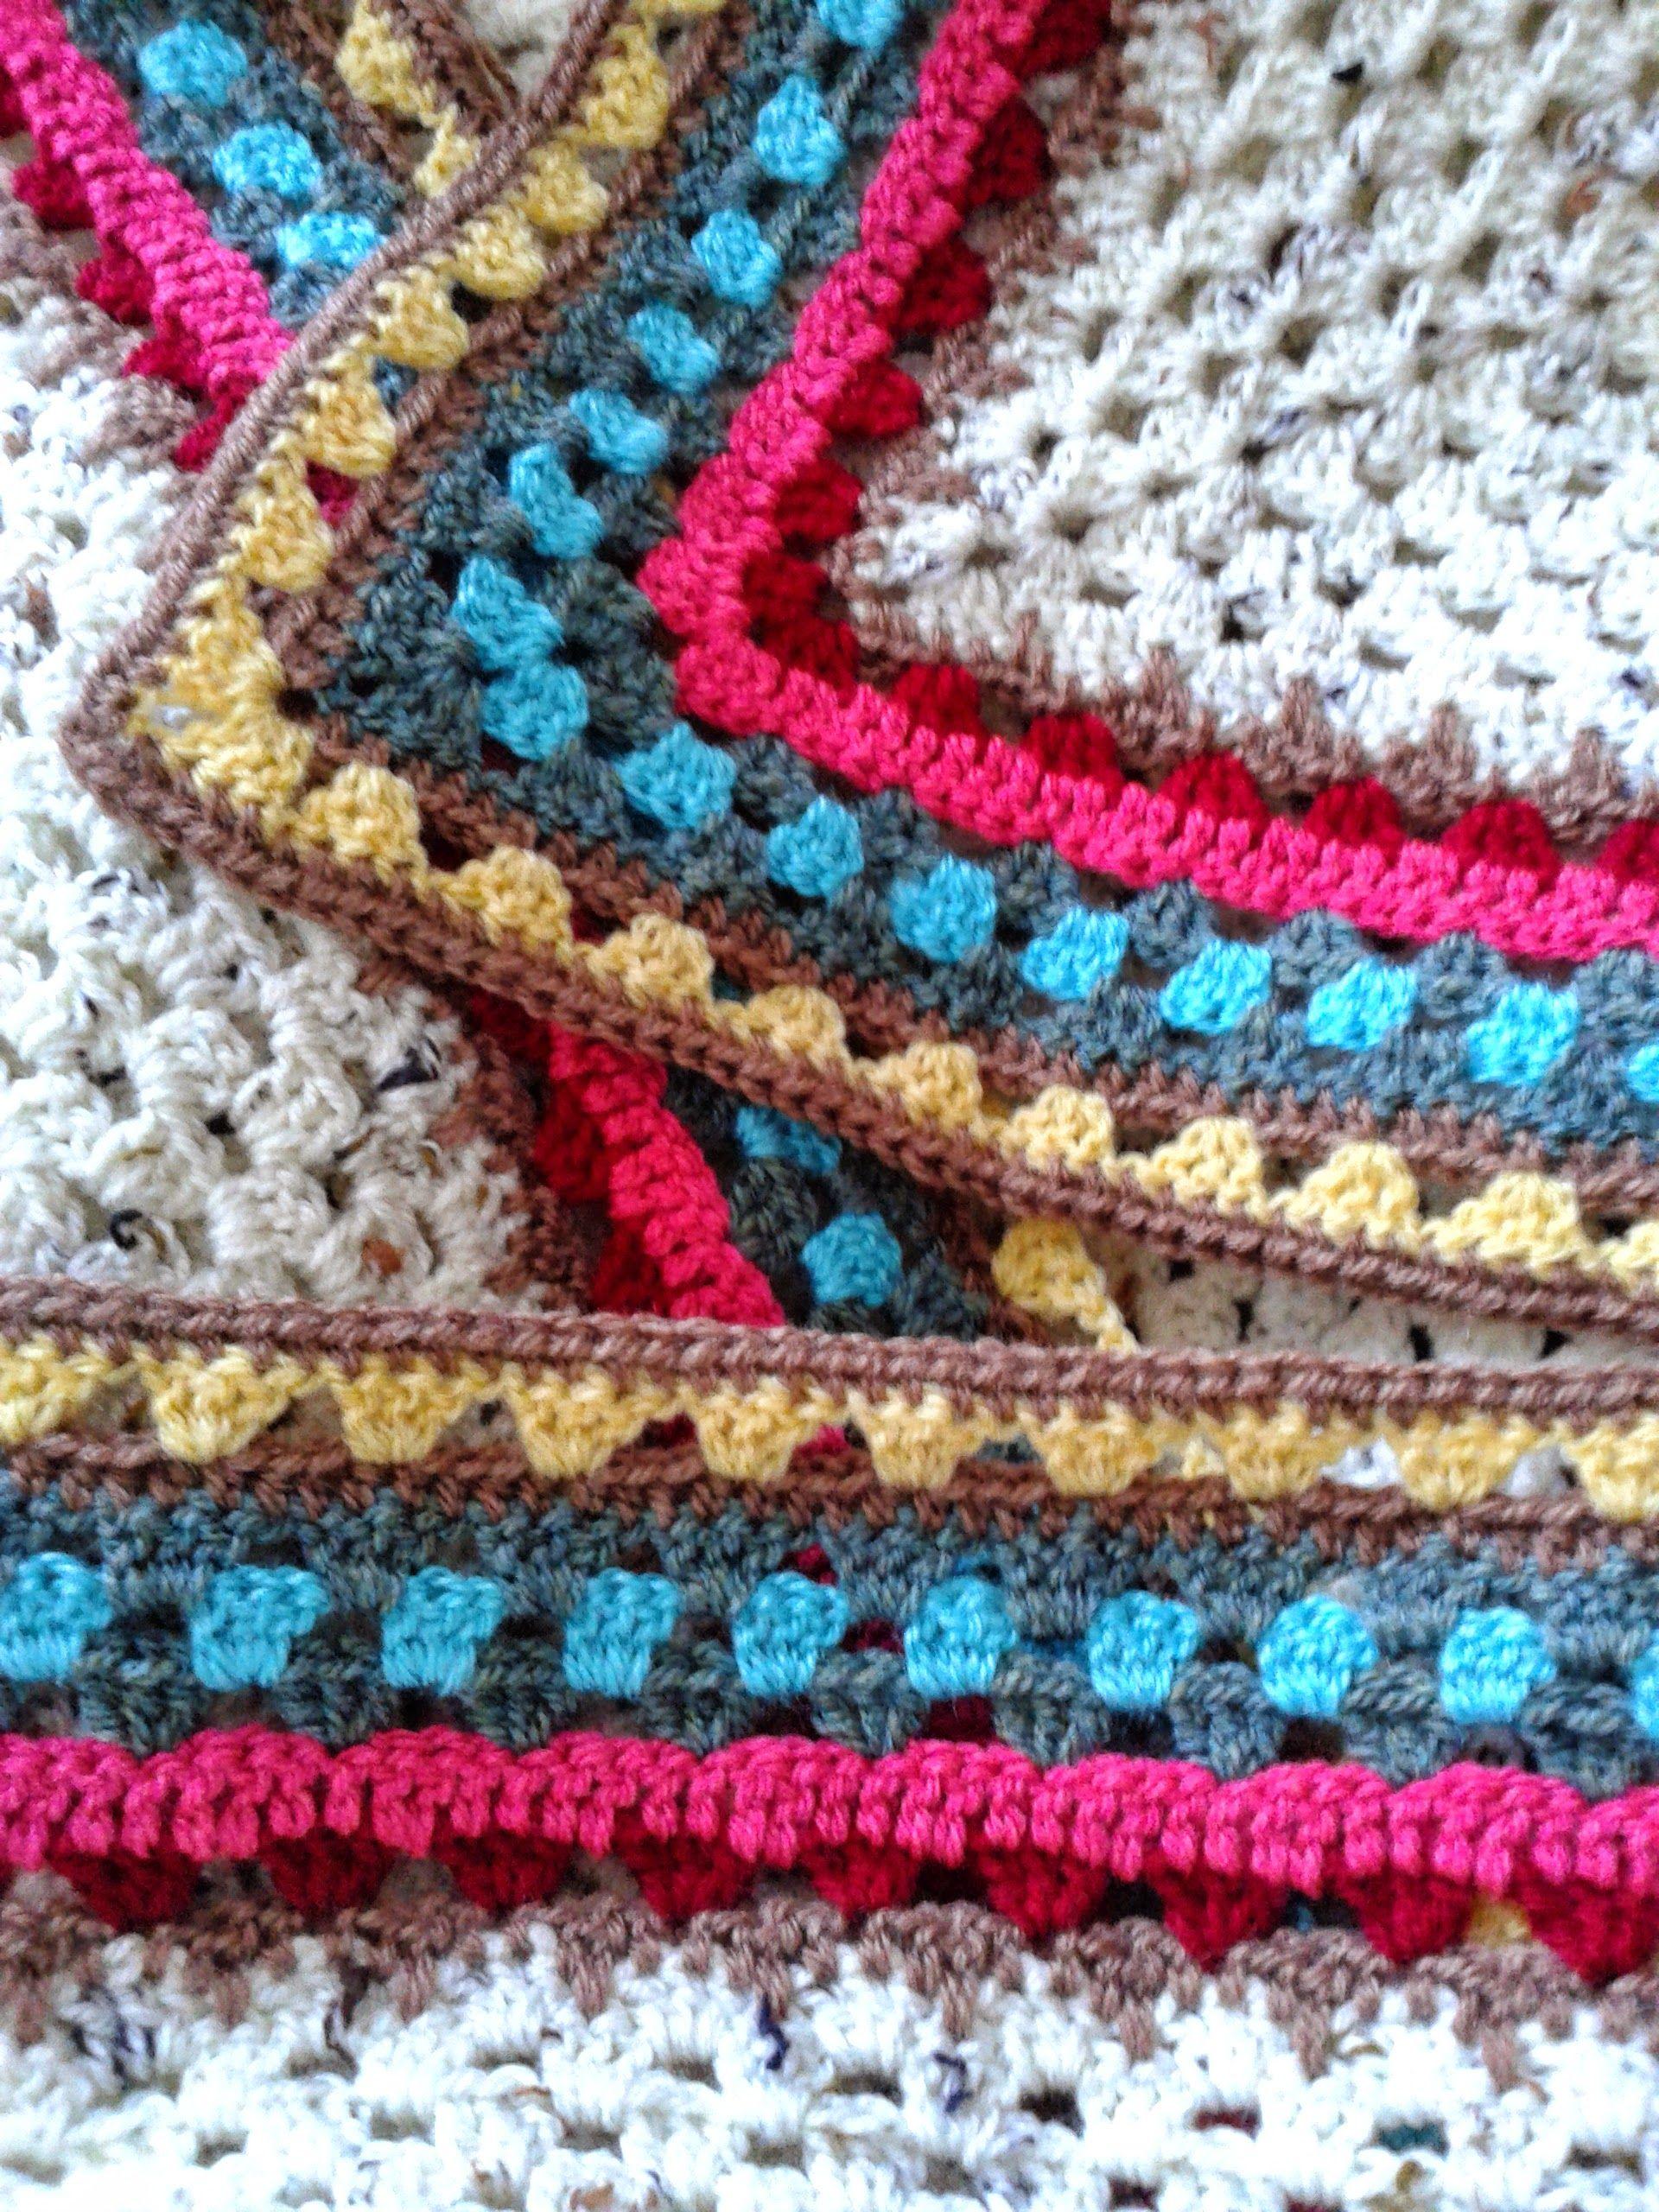 011 Red Spiral Crocheted Cushion   Bavarian crochet, Spiral crochet ...